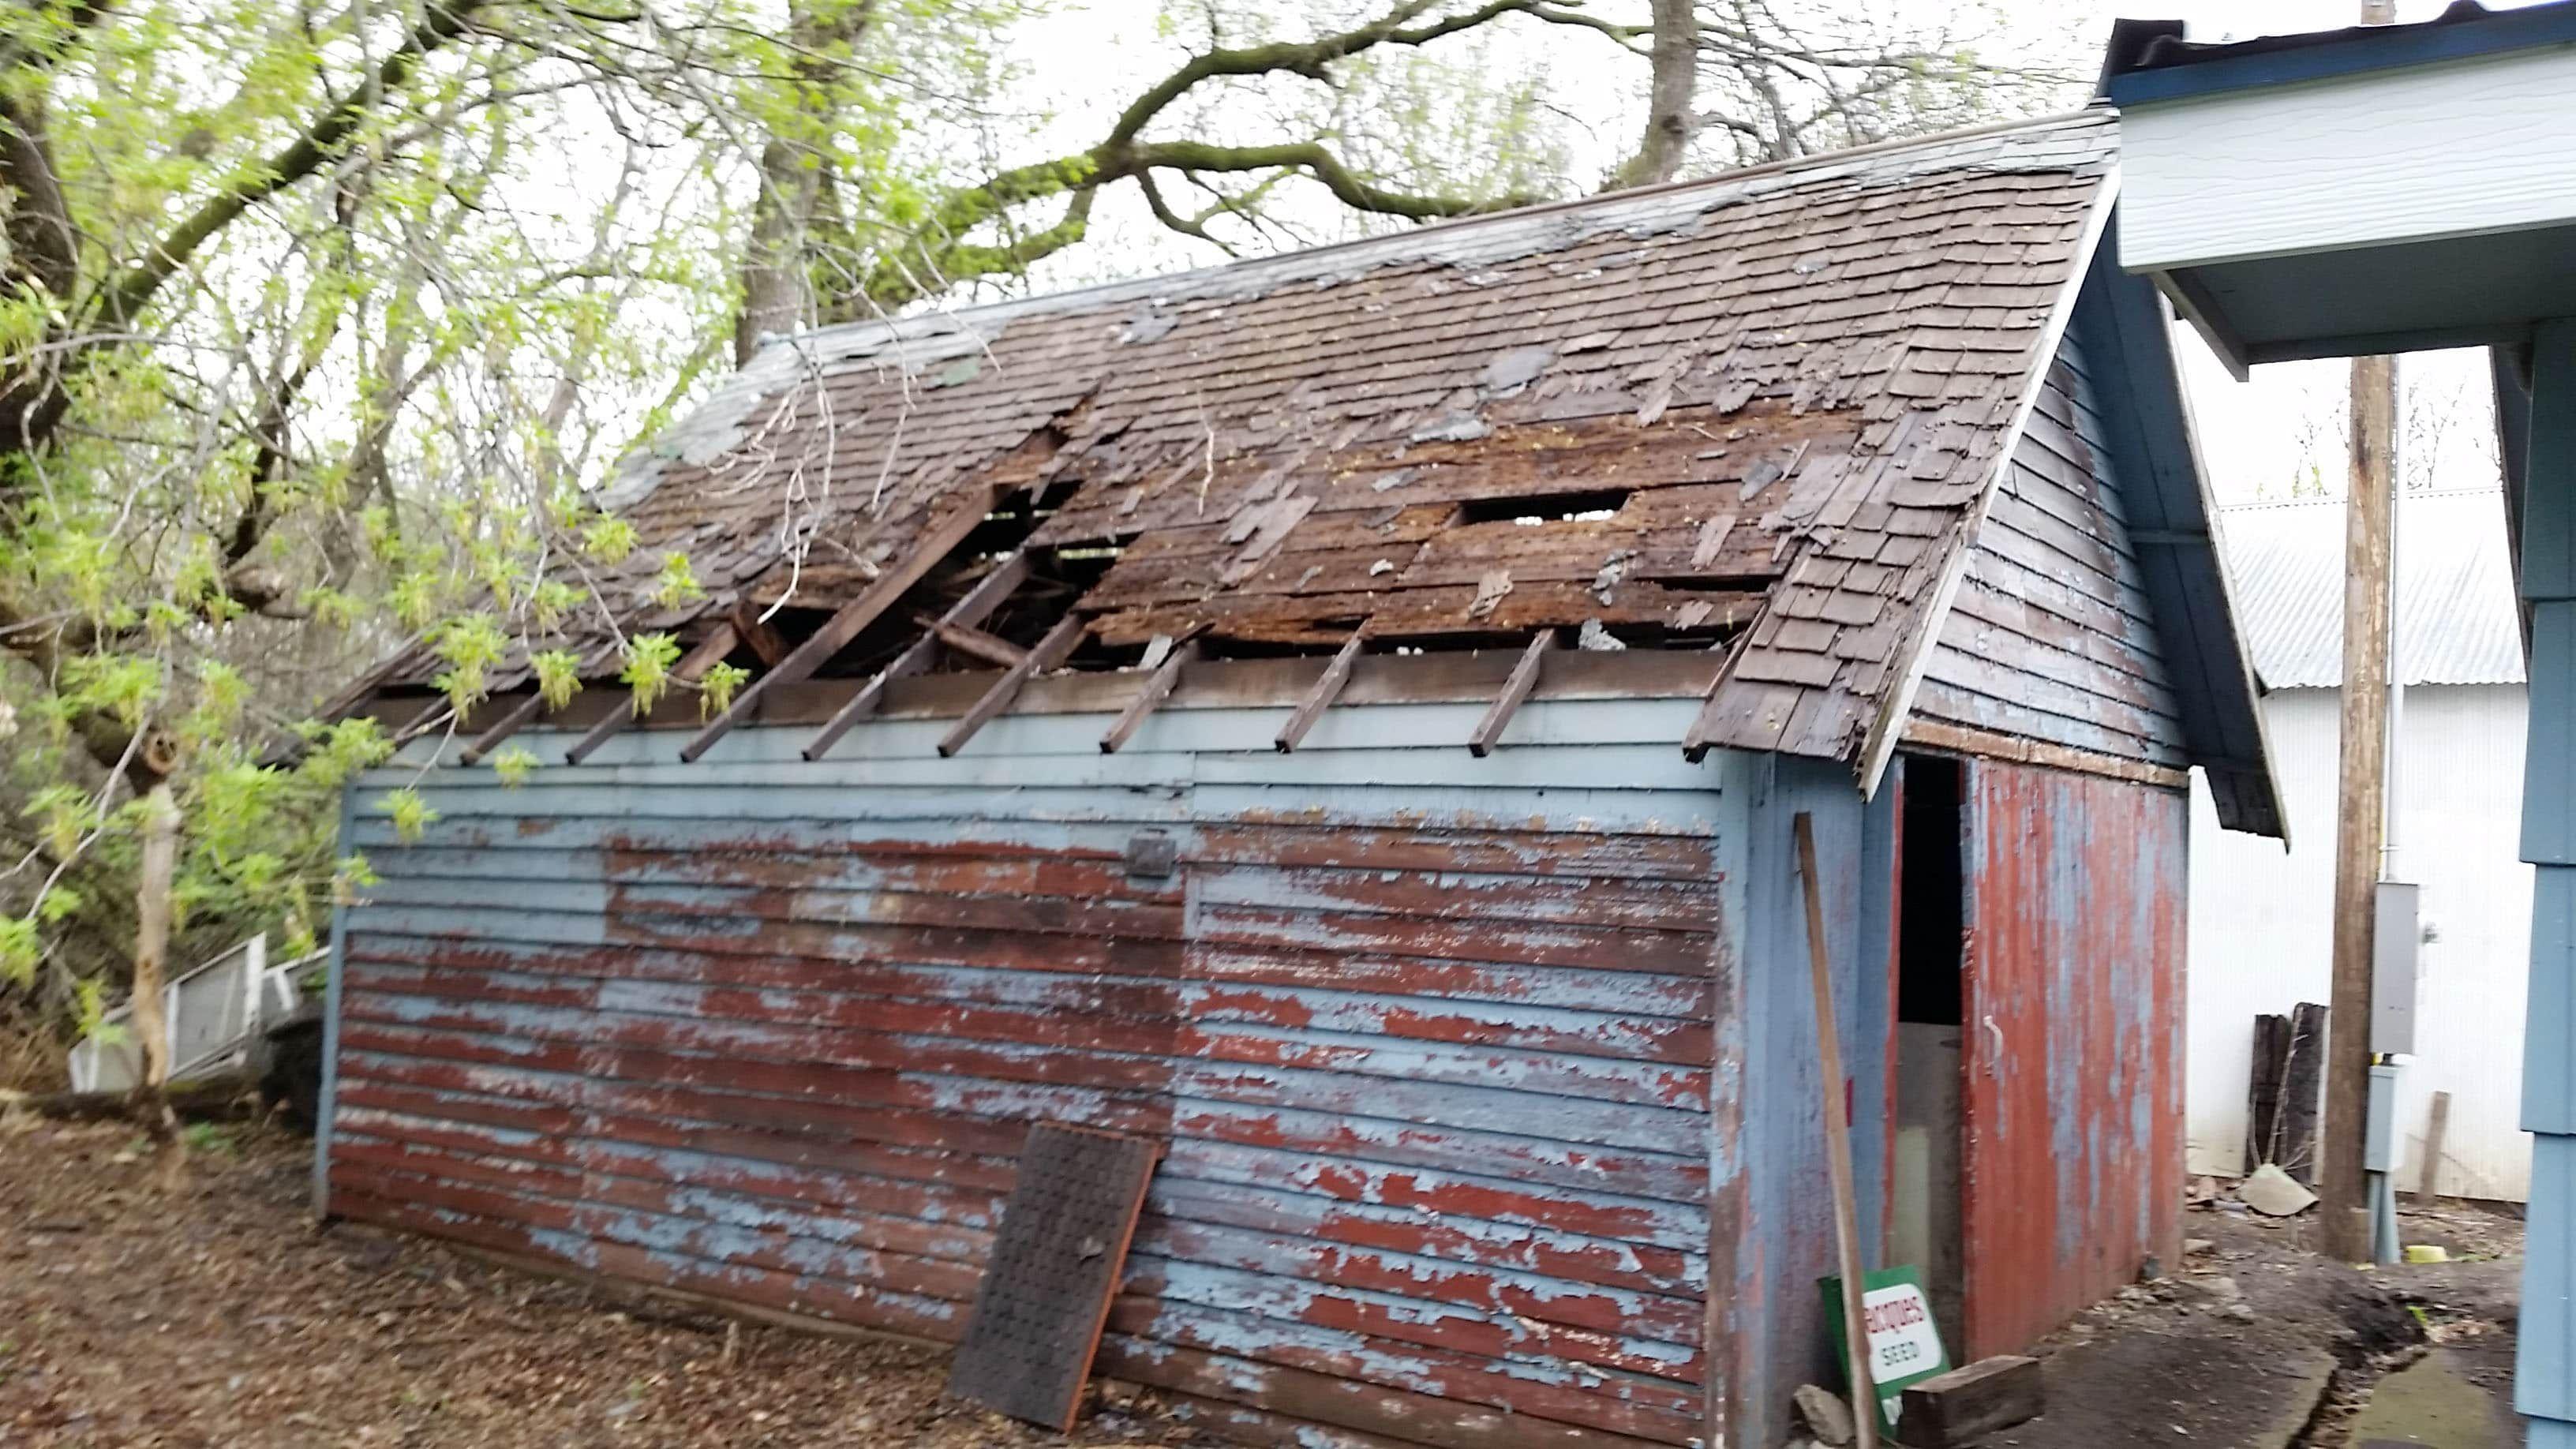 Diy Tips On Repairing A Battered Old Garage Roof Repair Diy Old Garage Diy Roofing